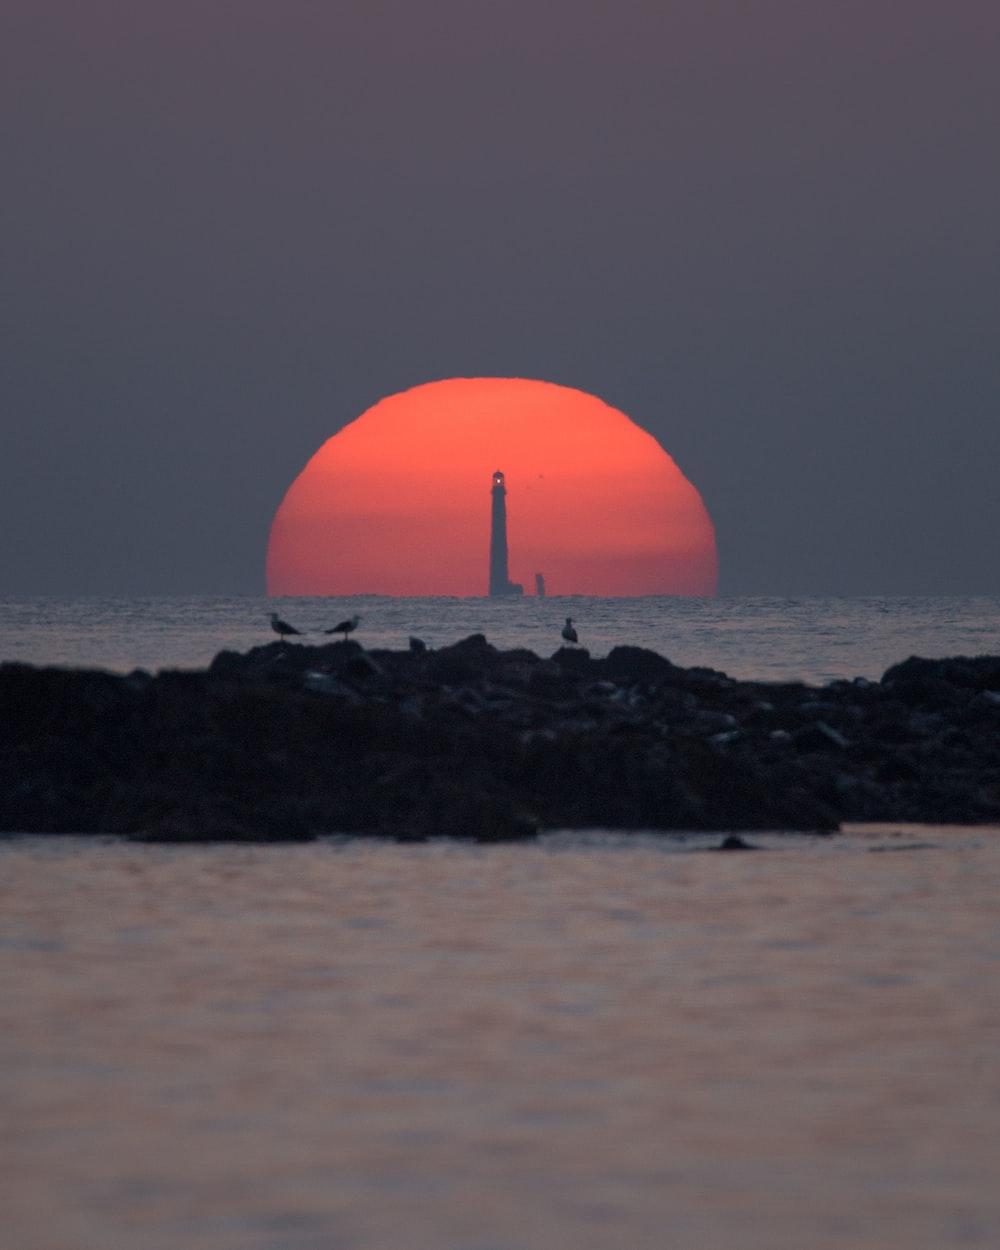 orange ball on black rock near body of water during sunset